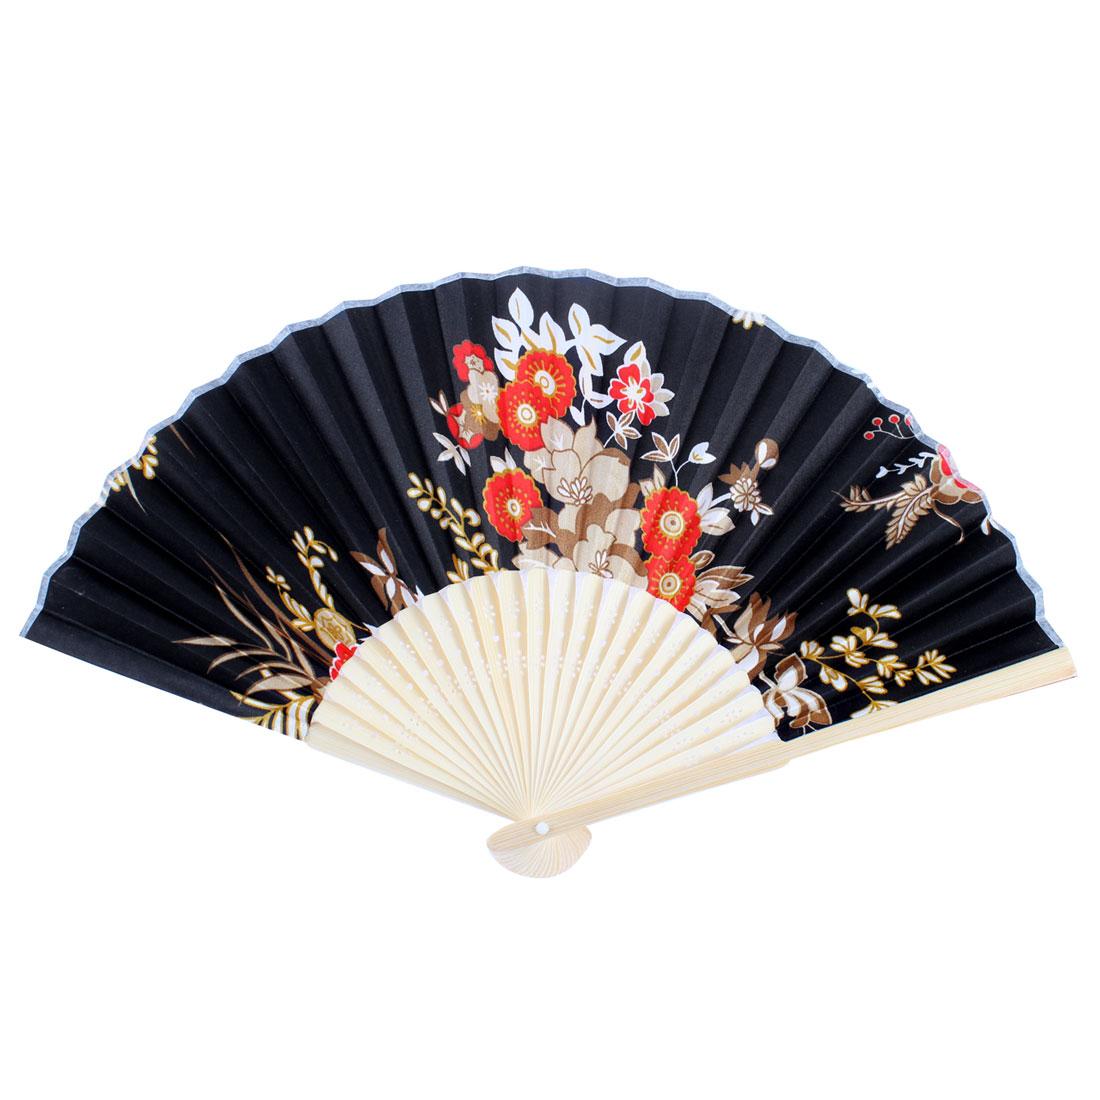 Wood Carved Frame Floral Printed Foldable Portable Summer Hand Fan Black